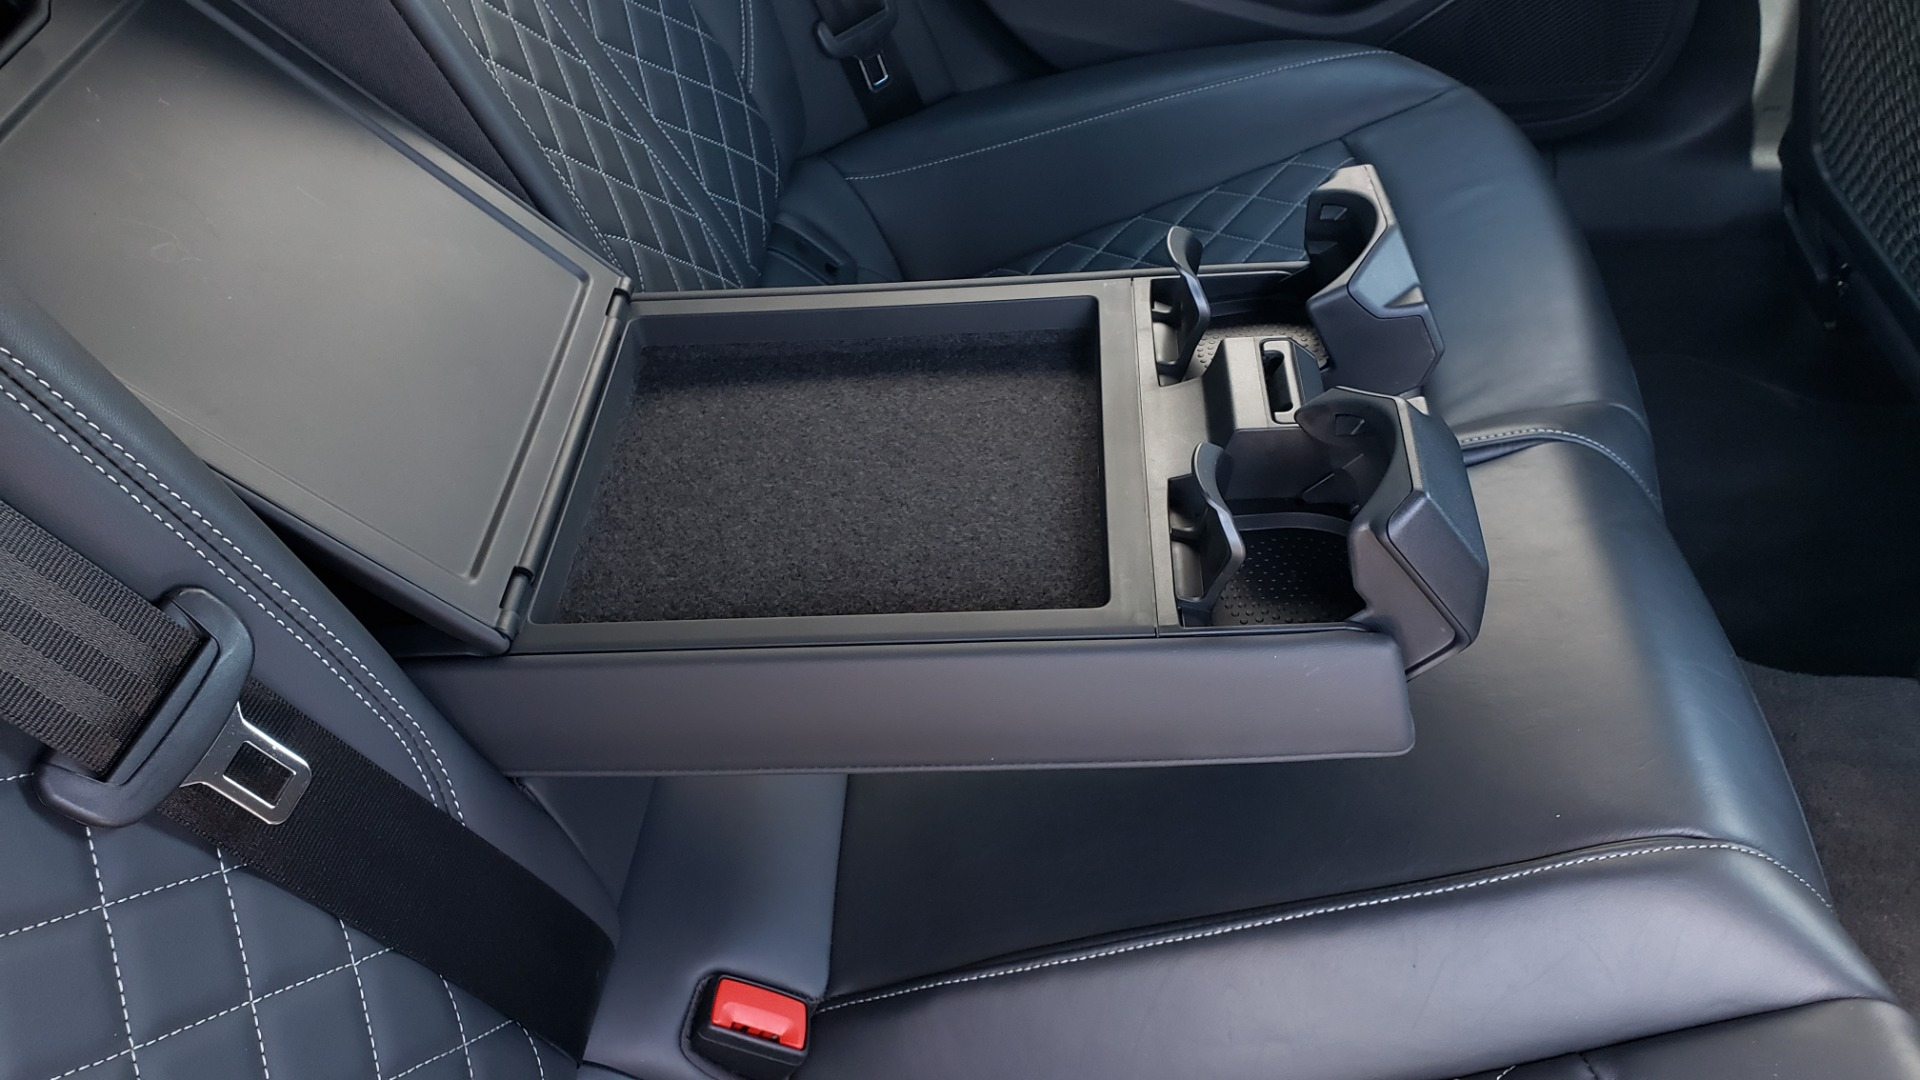 Used 2018 Audi S5 SPORTBACK PRESTIGE S-SPORT / NAV / SUNROOF / HUD / B&O SND / REARVIEW for sale $48,995 at Formula Imports in Charlotte NC 28227 63